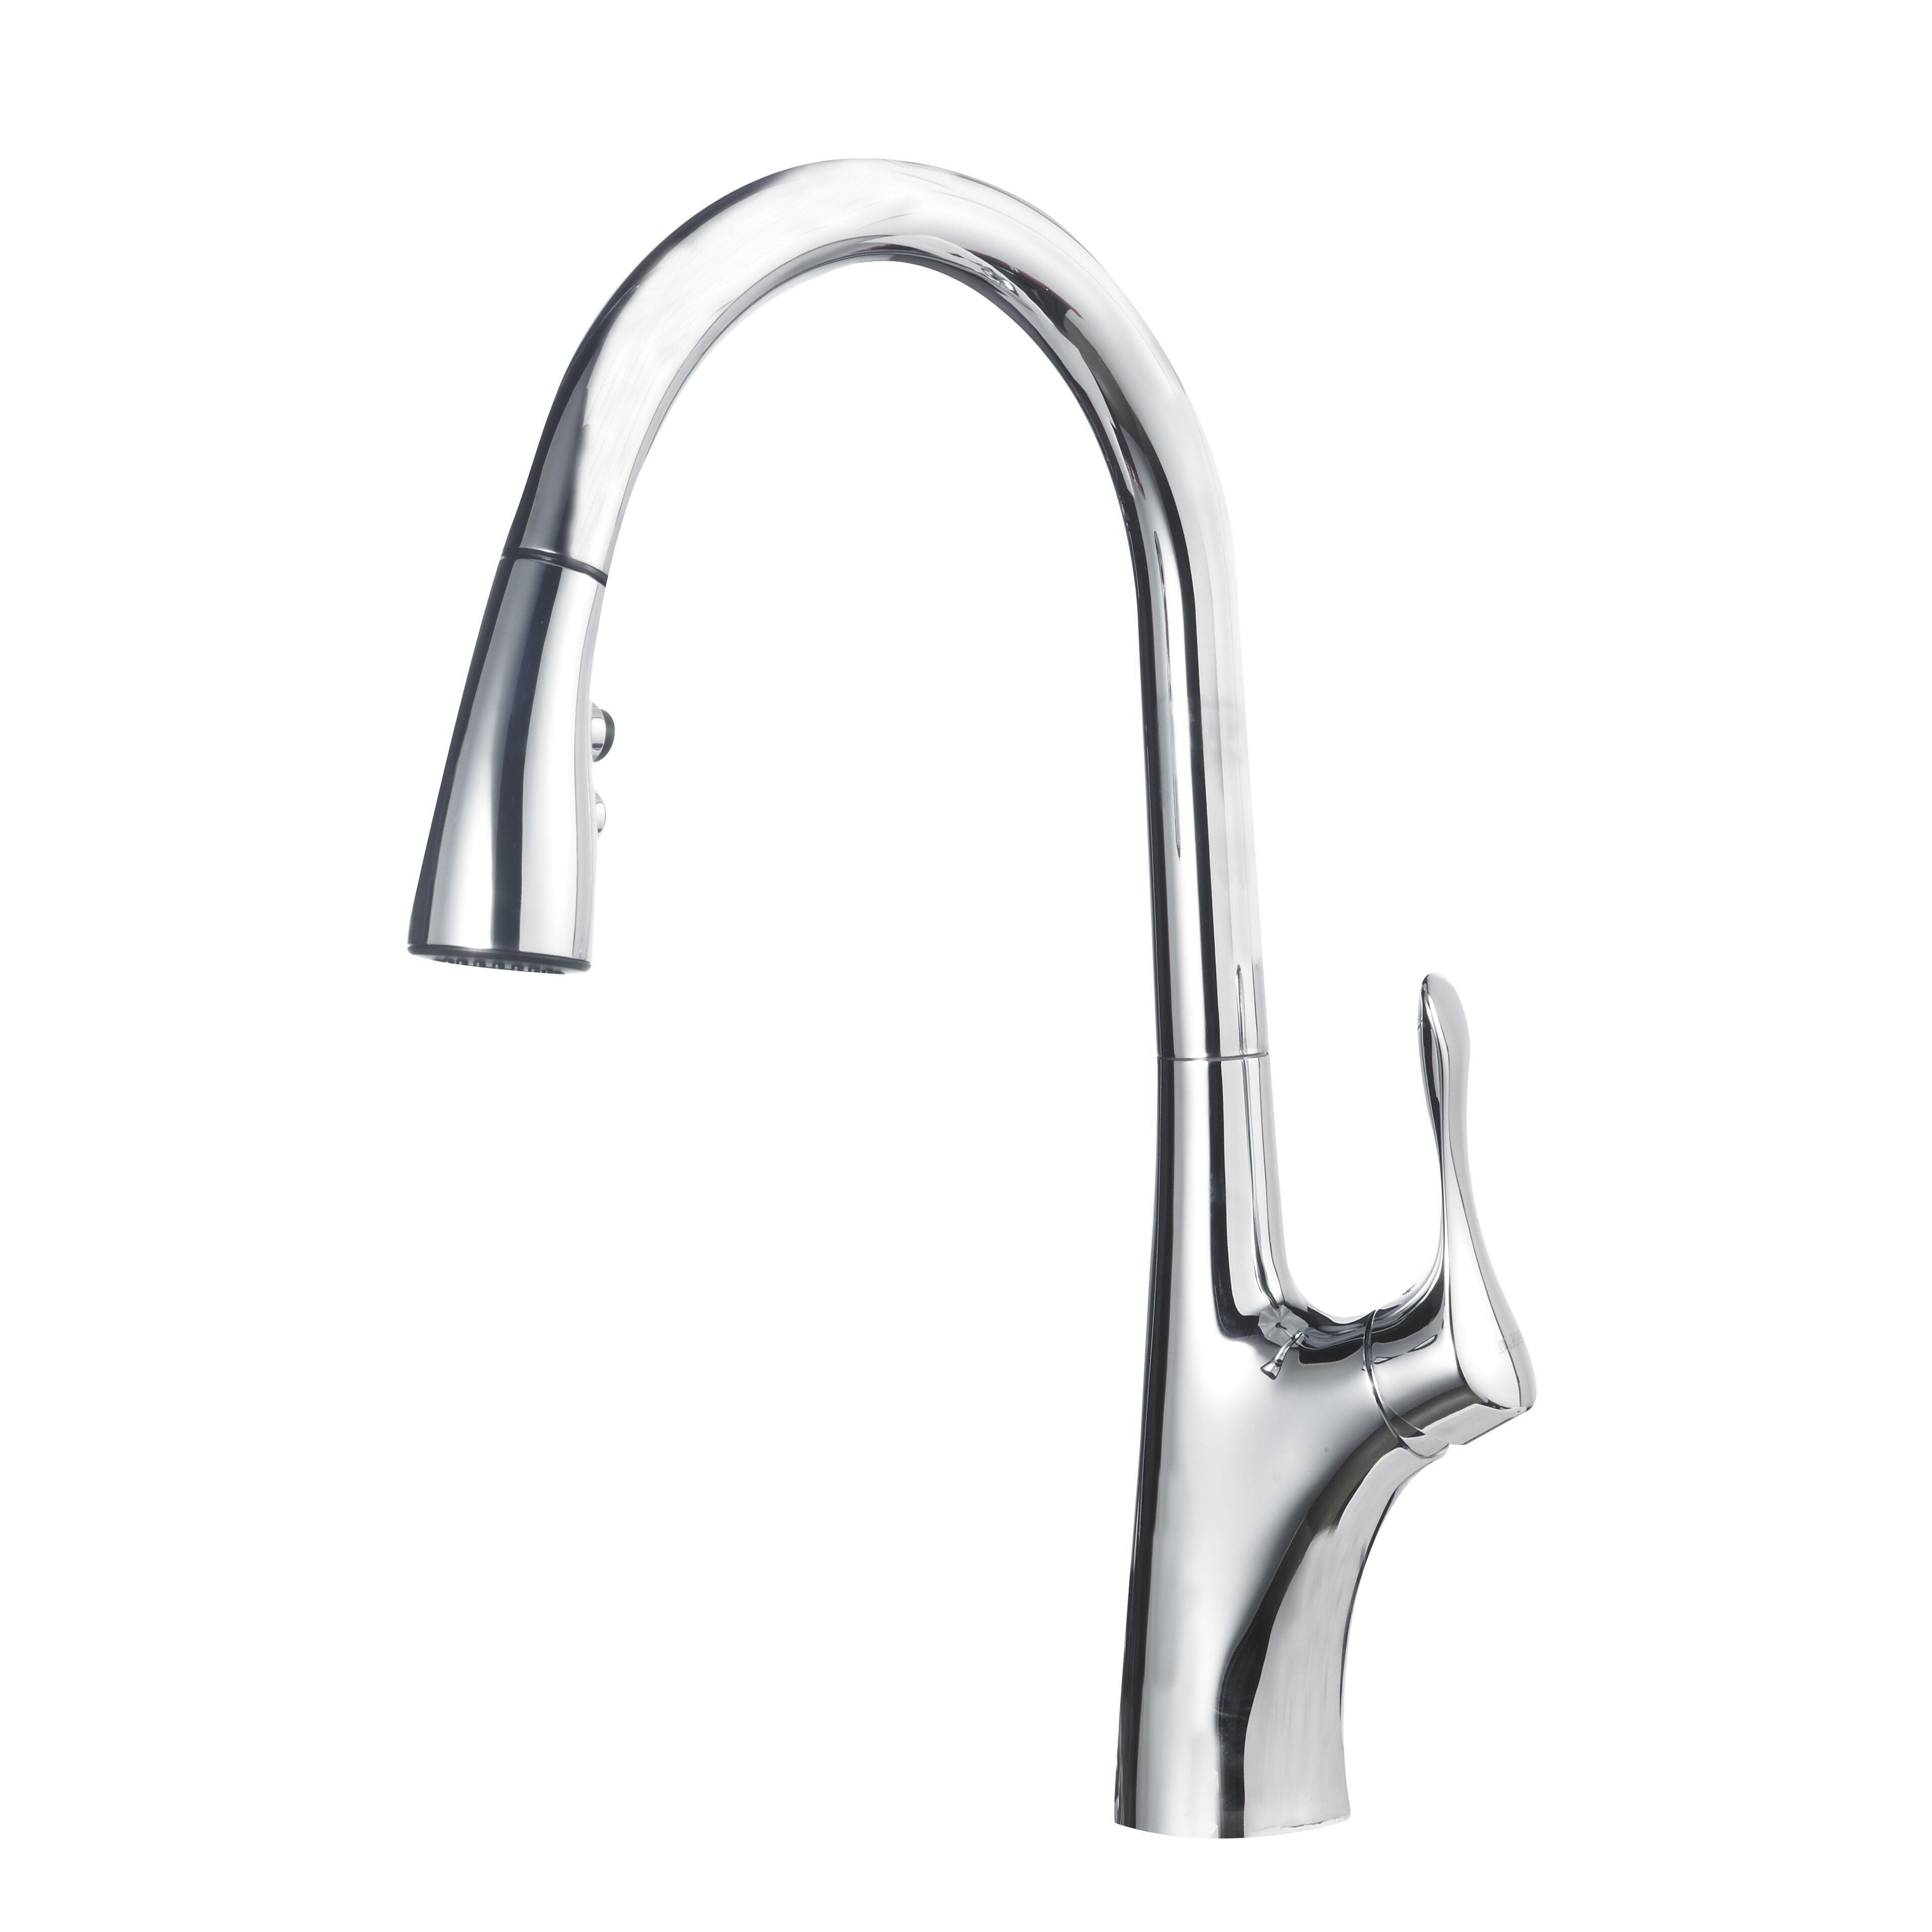 Blanco Kitchen Faucet Reviews Blanco Napa Single Handle Deck Mounted Standard Kitchen Faucet